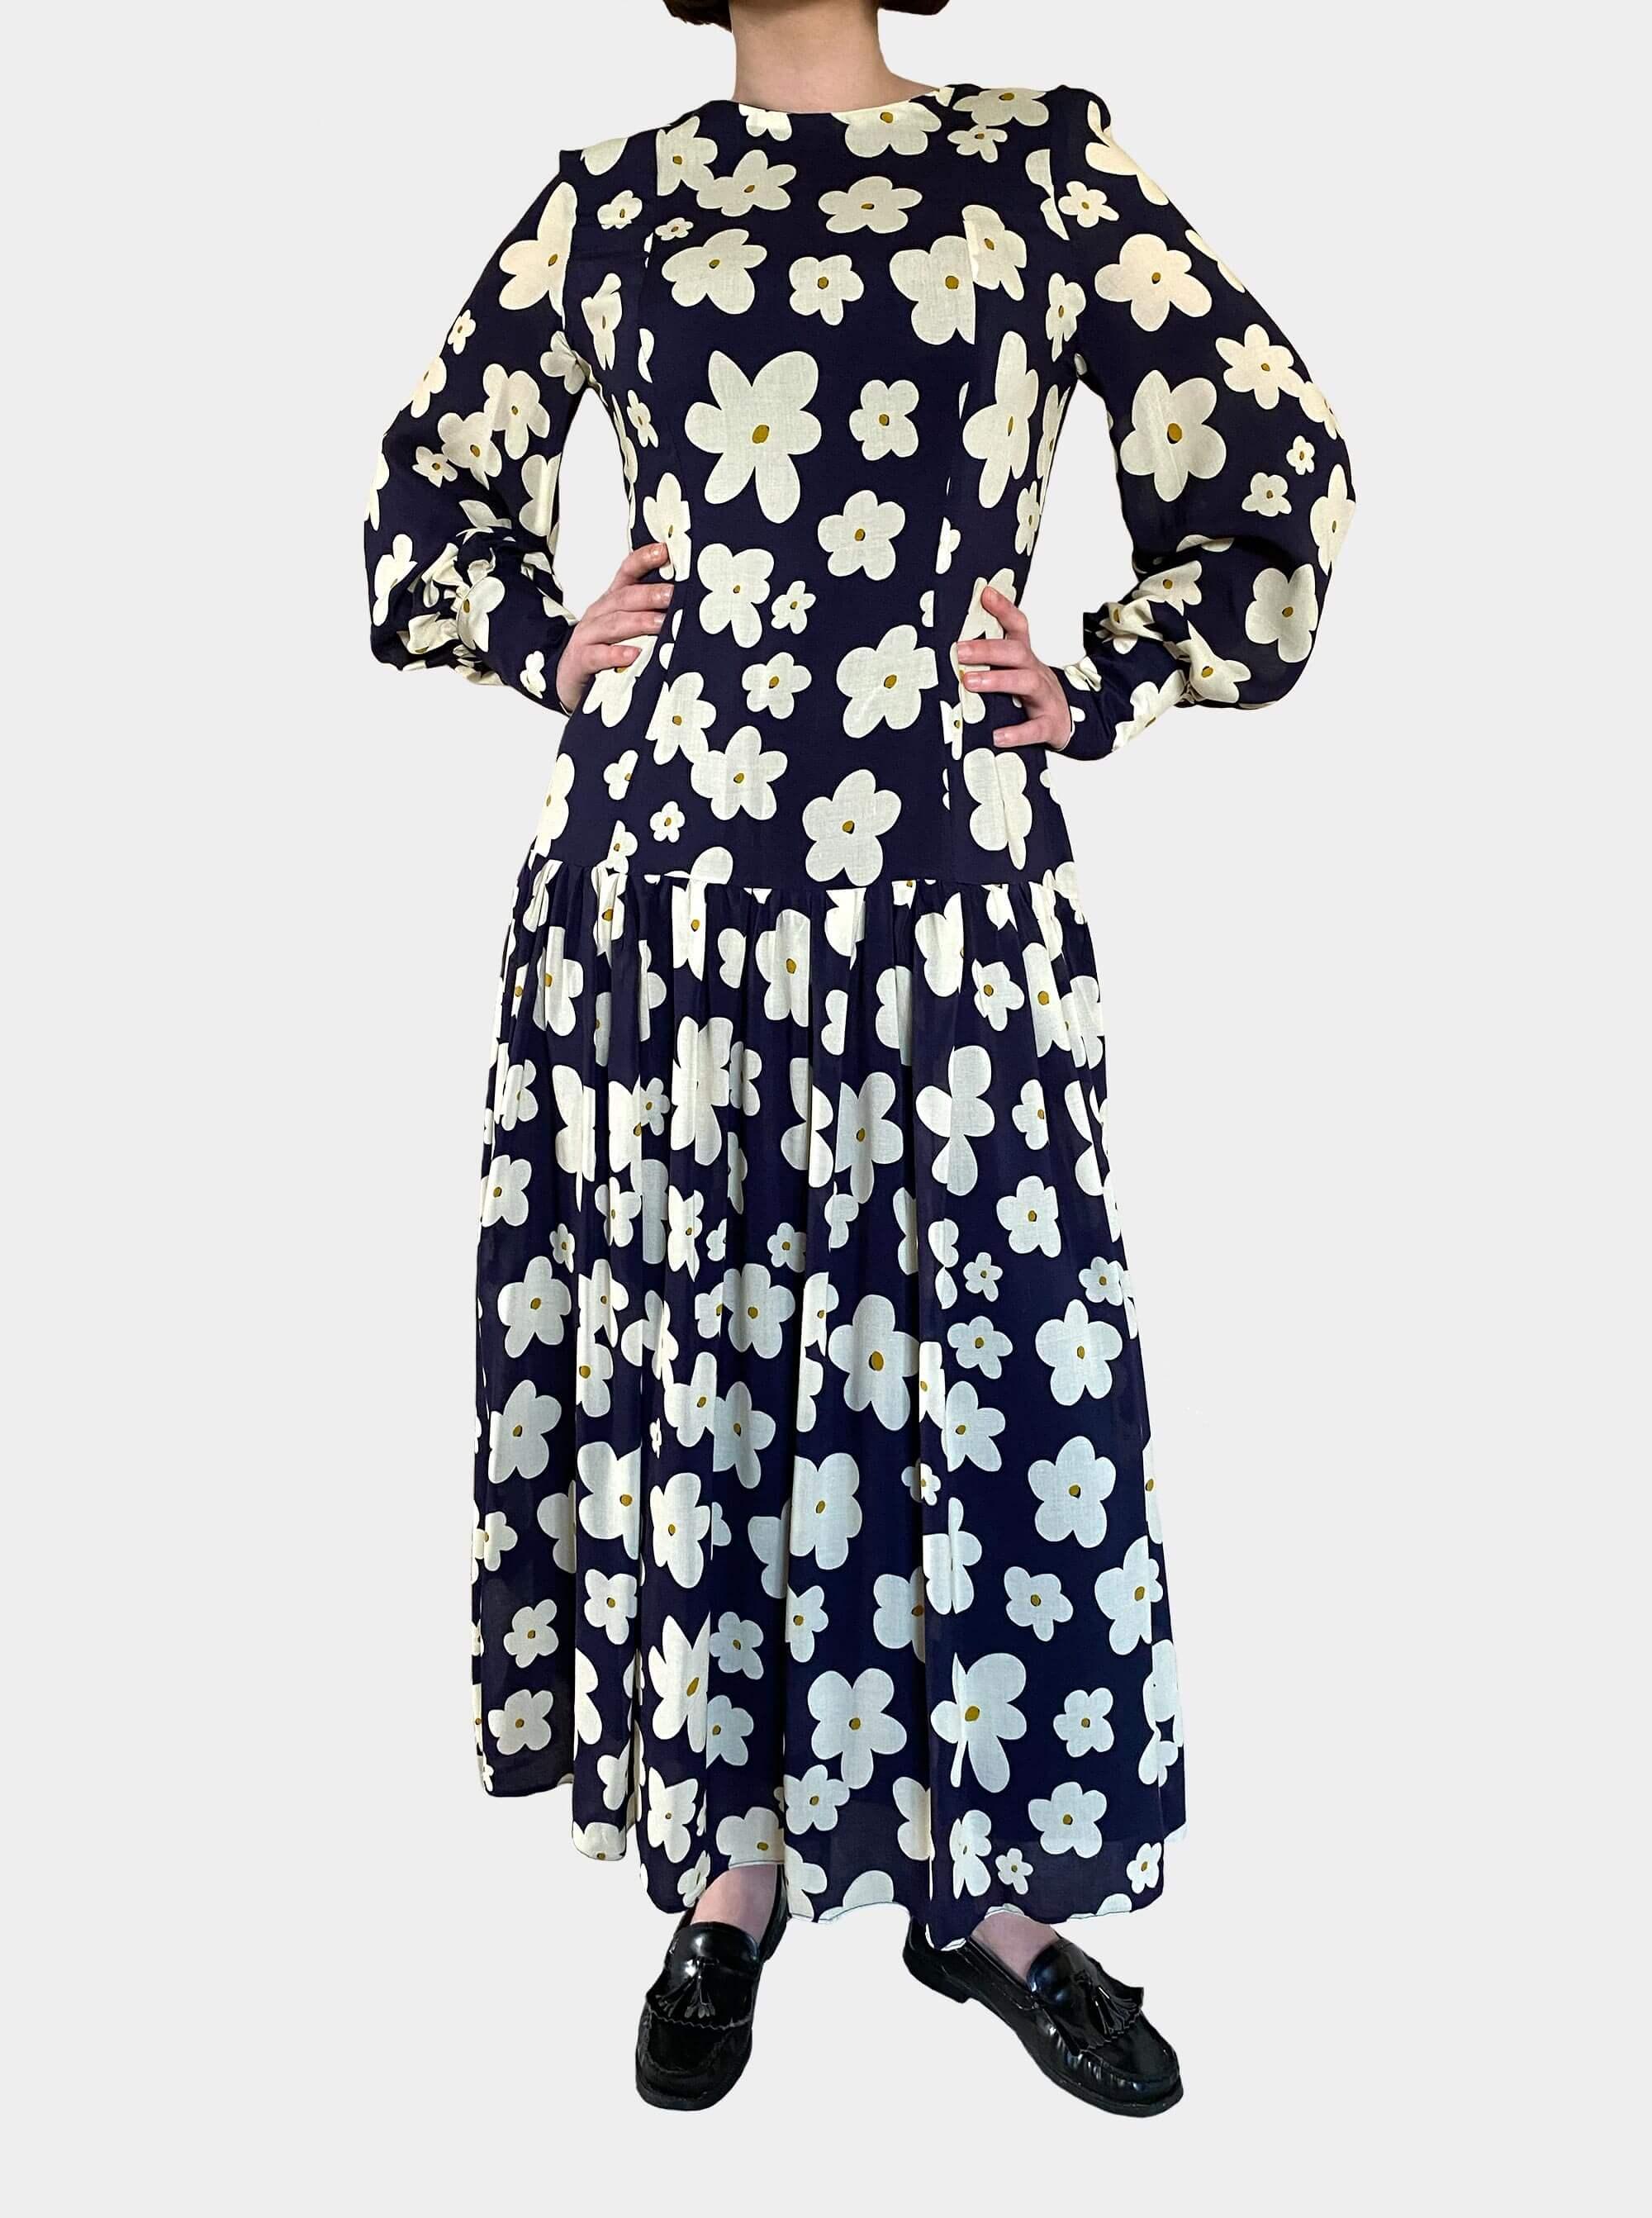 The Ottilie Dress